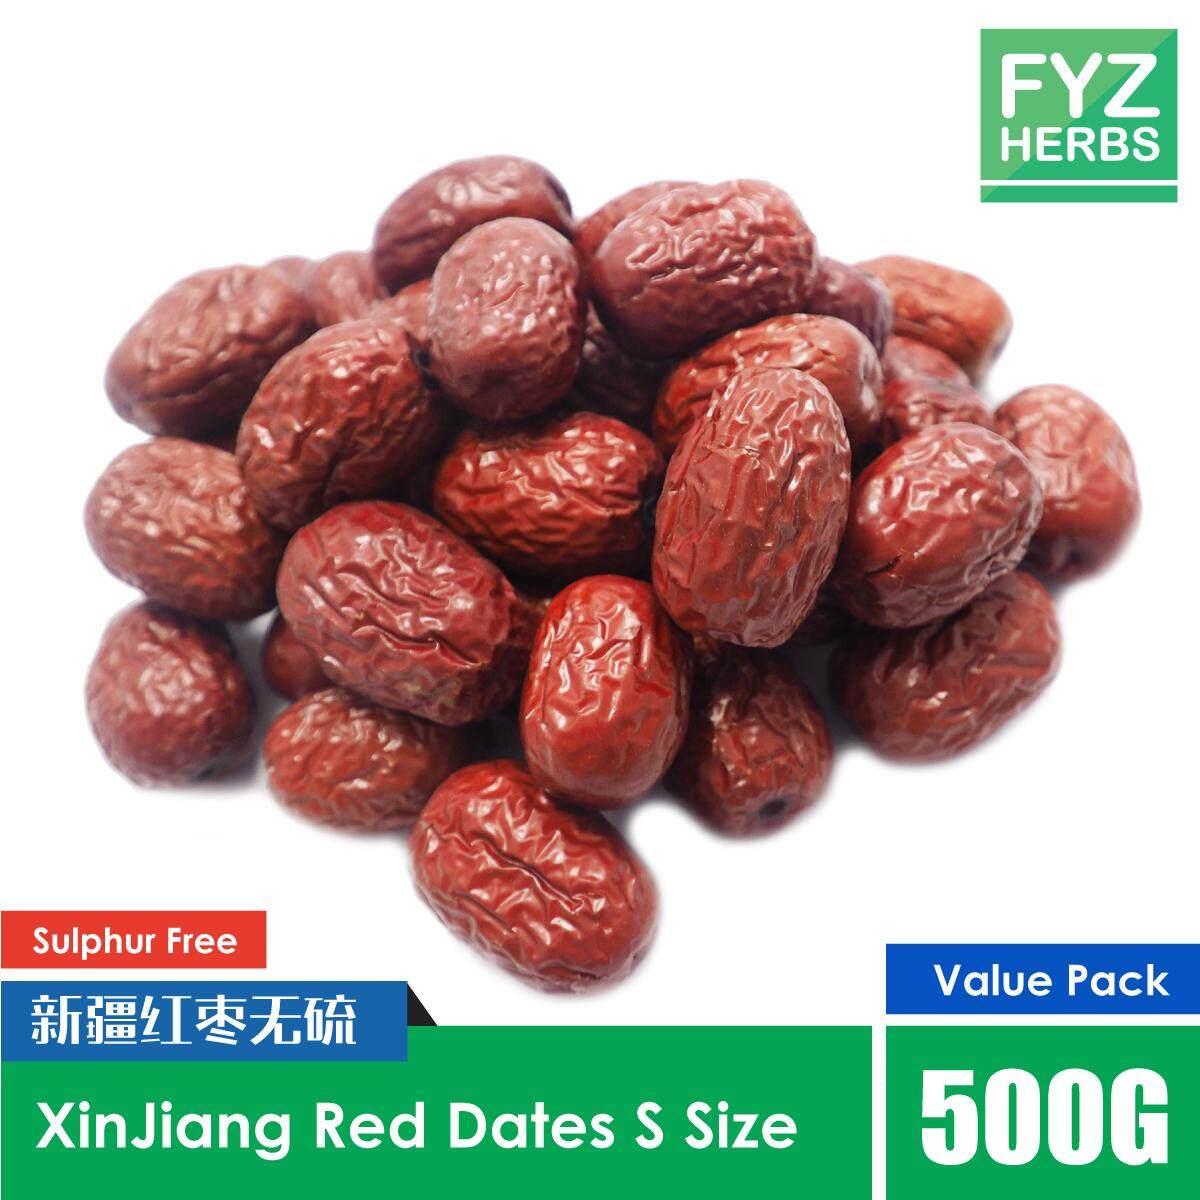 FYZ Herbs Red Dates Sulphur Free S Size 500G [Value Pack] 新疆无硫红枣 S Size 500g